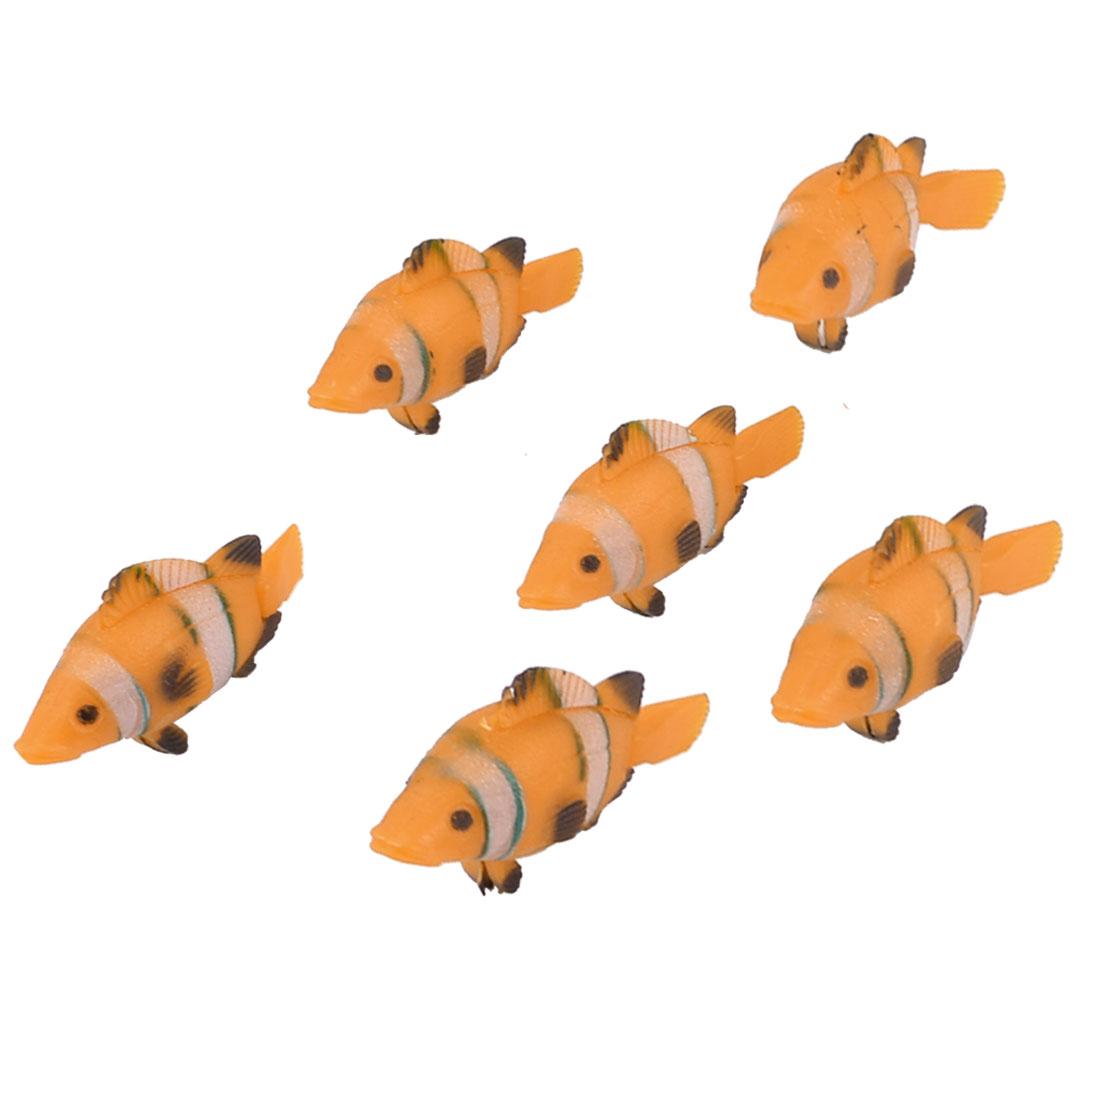 Wiggling Tail Orange Black Plastic Fishes Aquarium Fish Tank Decor 6 Pcs